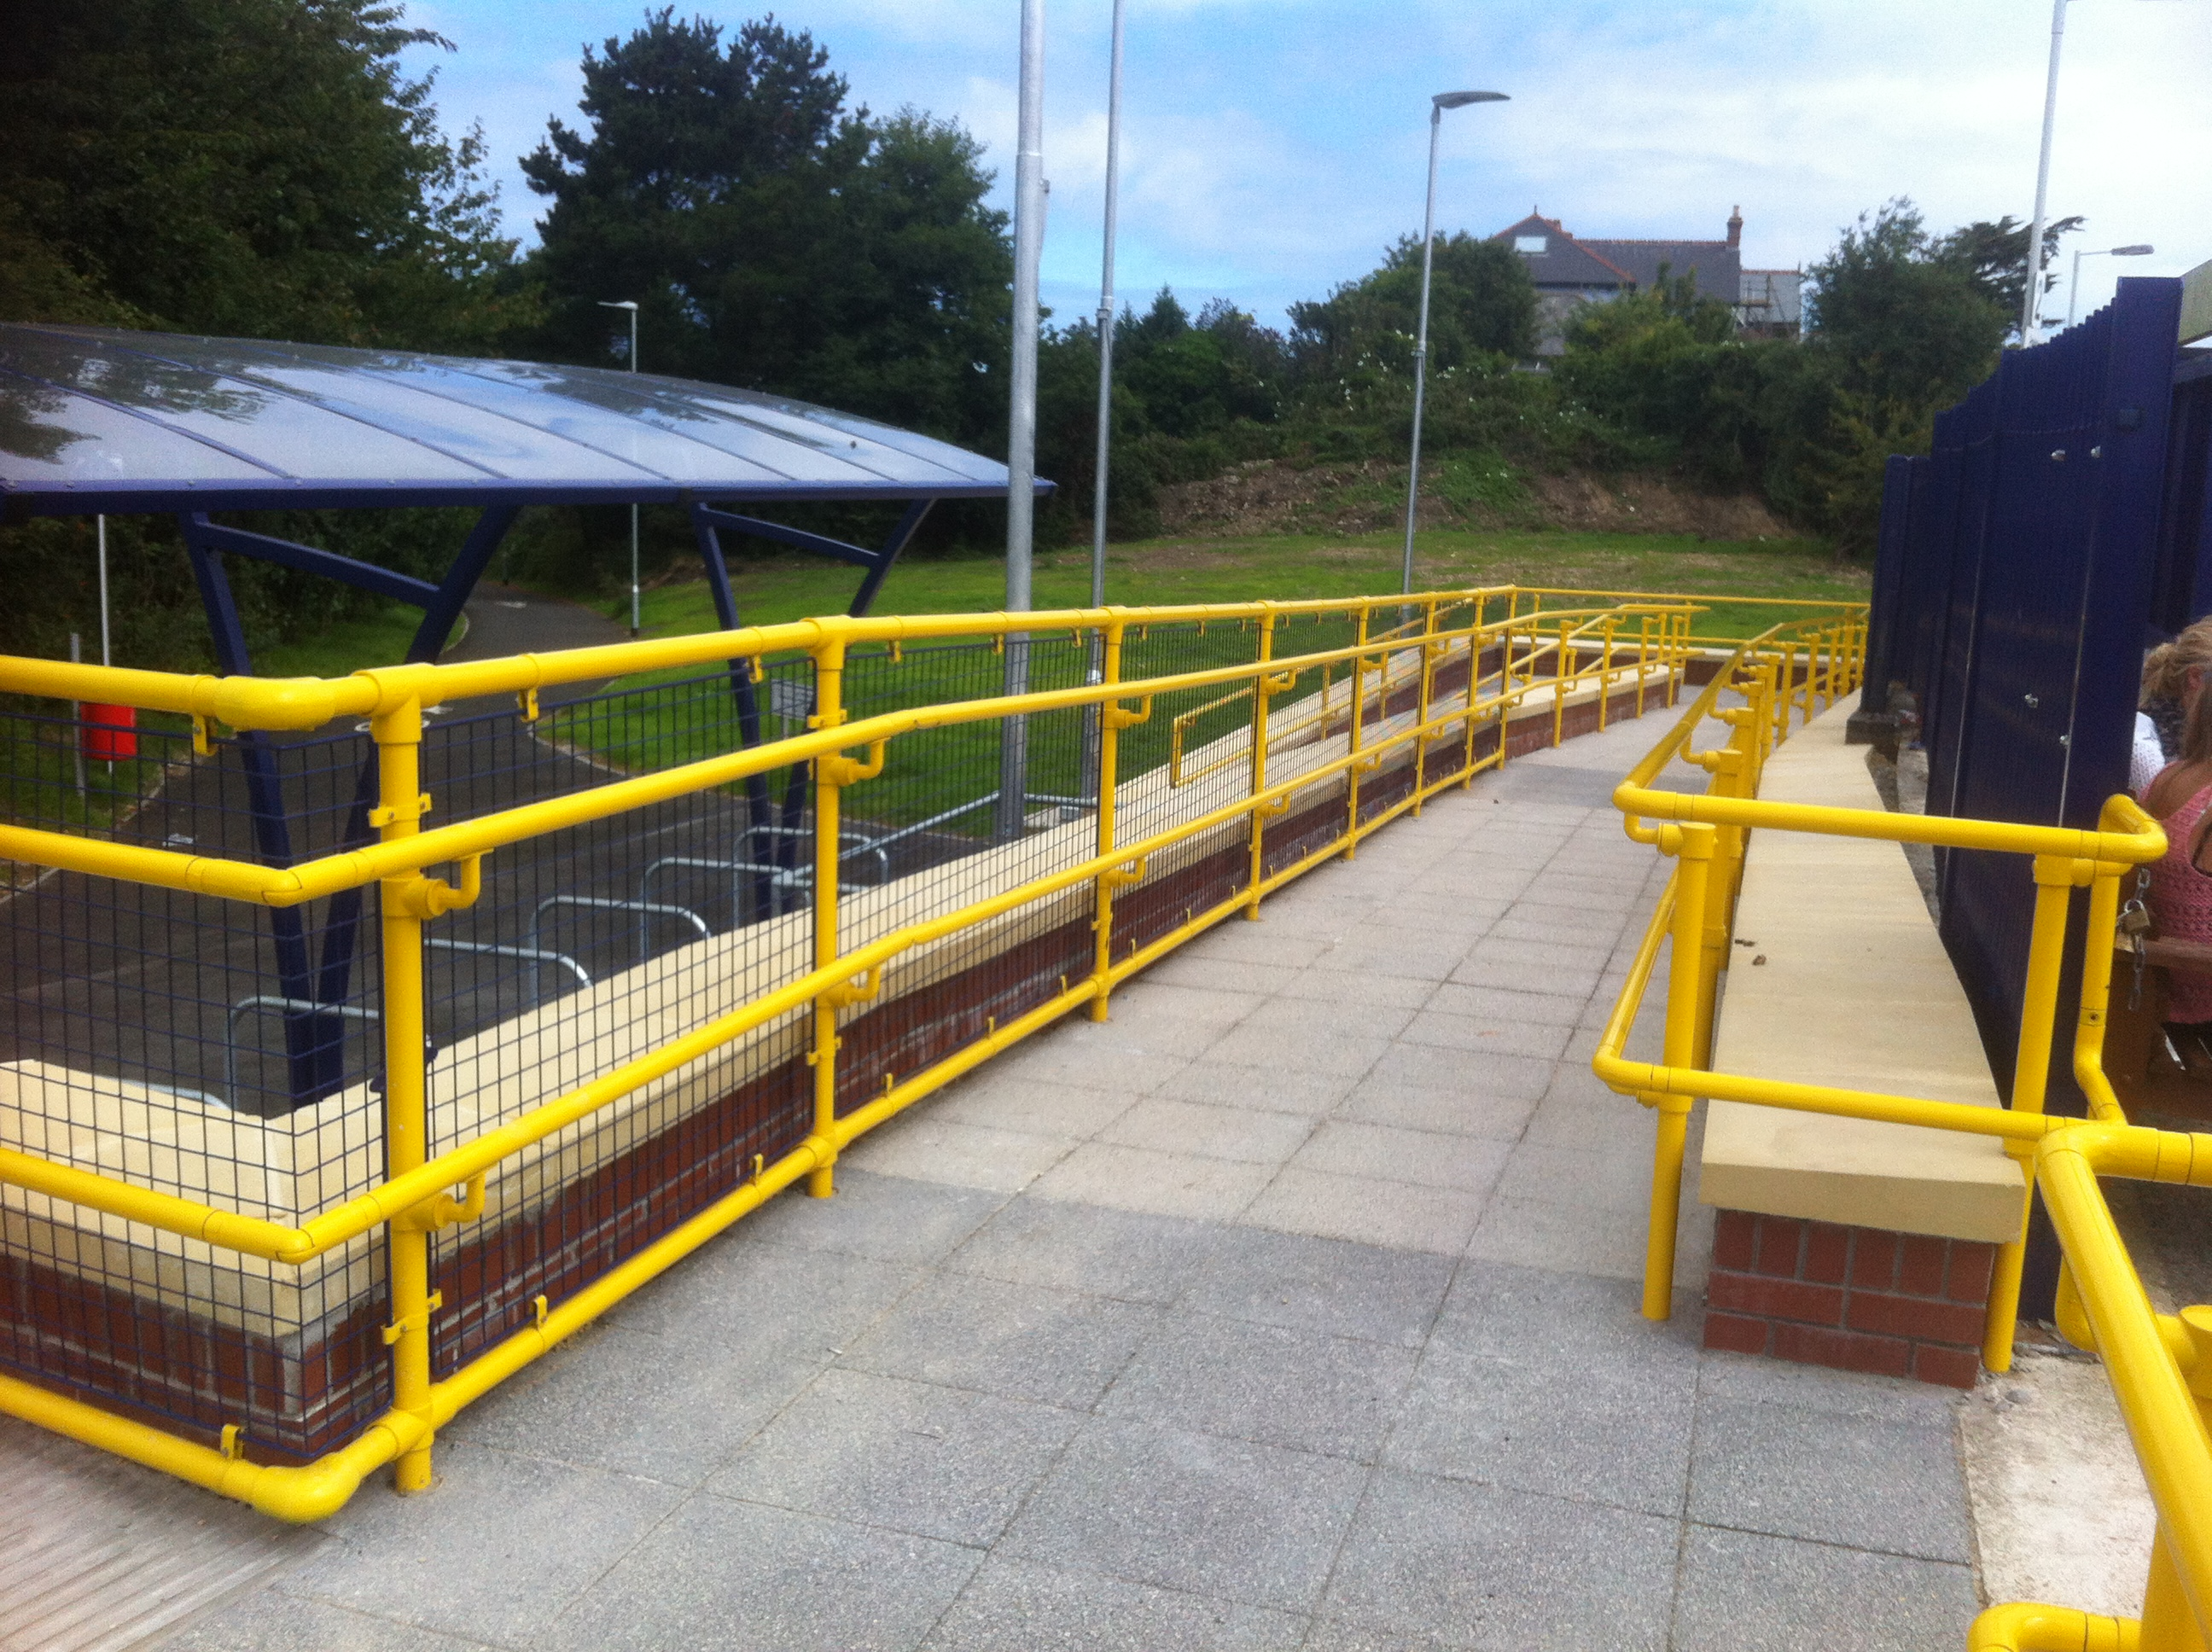 Kee_Access_handrailing_at_Hayle_Railway_station.JPG